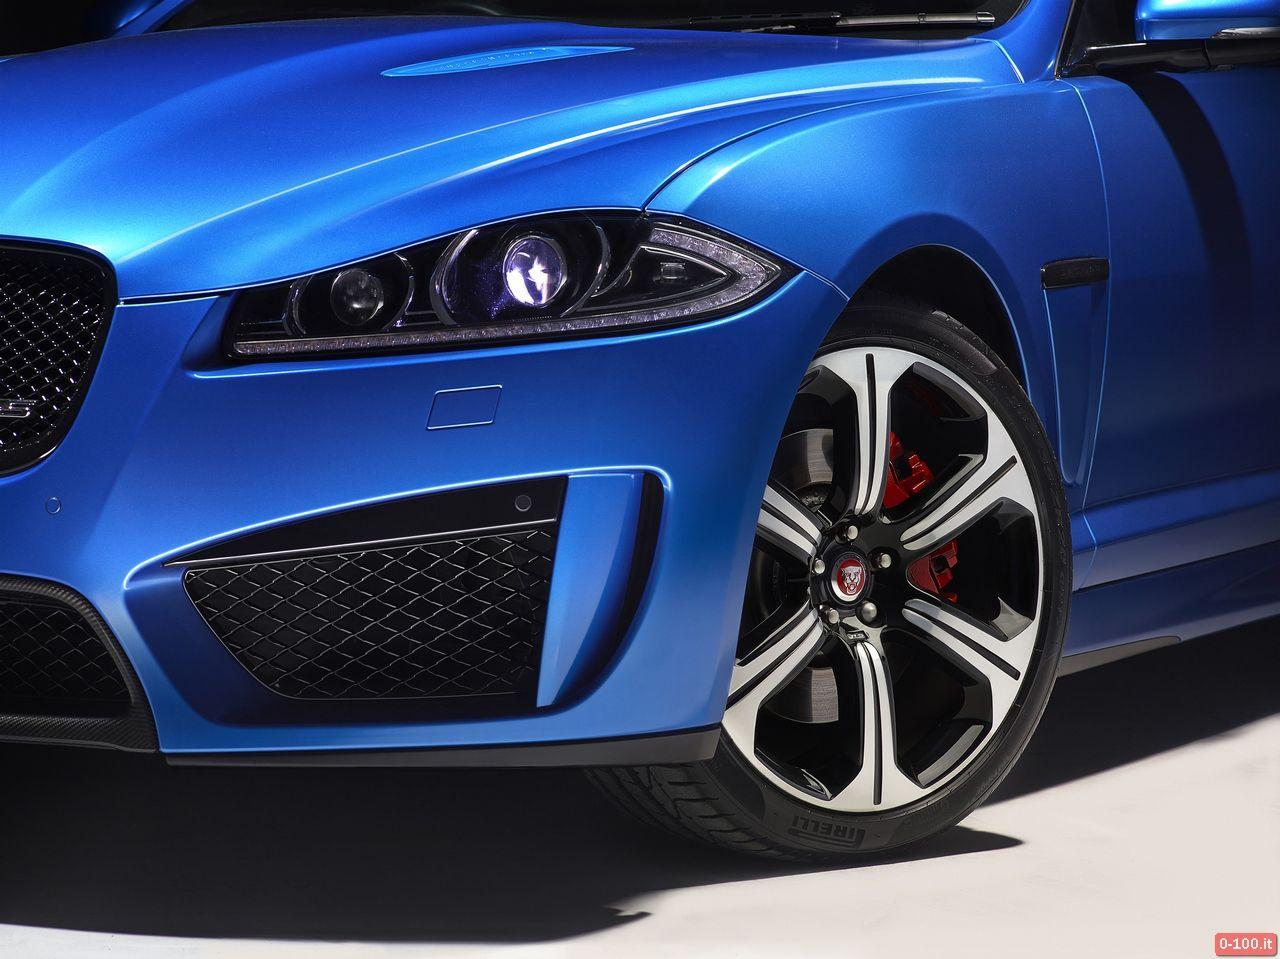 ginevra-2014-jaguar-xf-model-year-2015-xfr-s-sportbrake-0-100_37